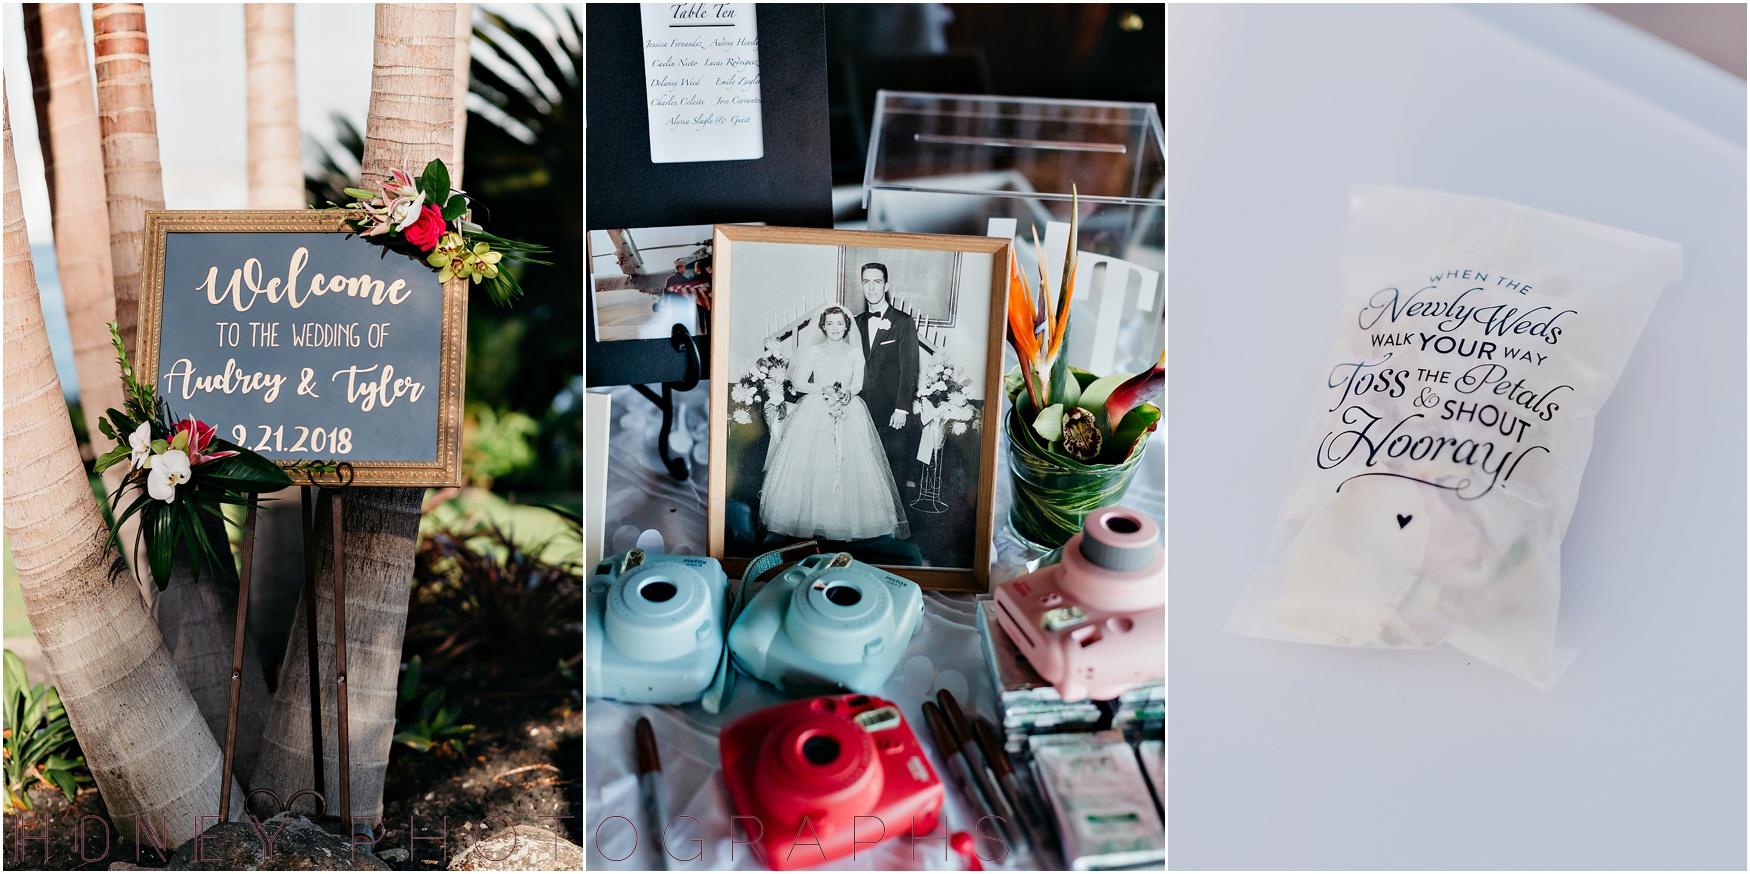 bali-hai-tropical-bubble-exit-party-paradise-wedding018.jpg